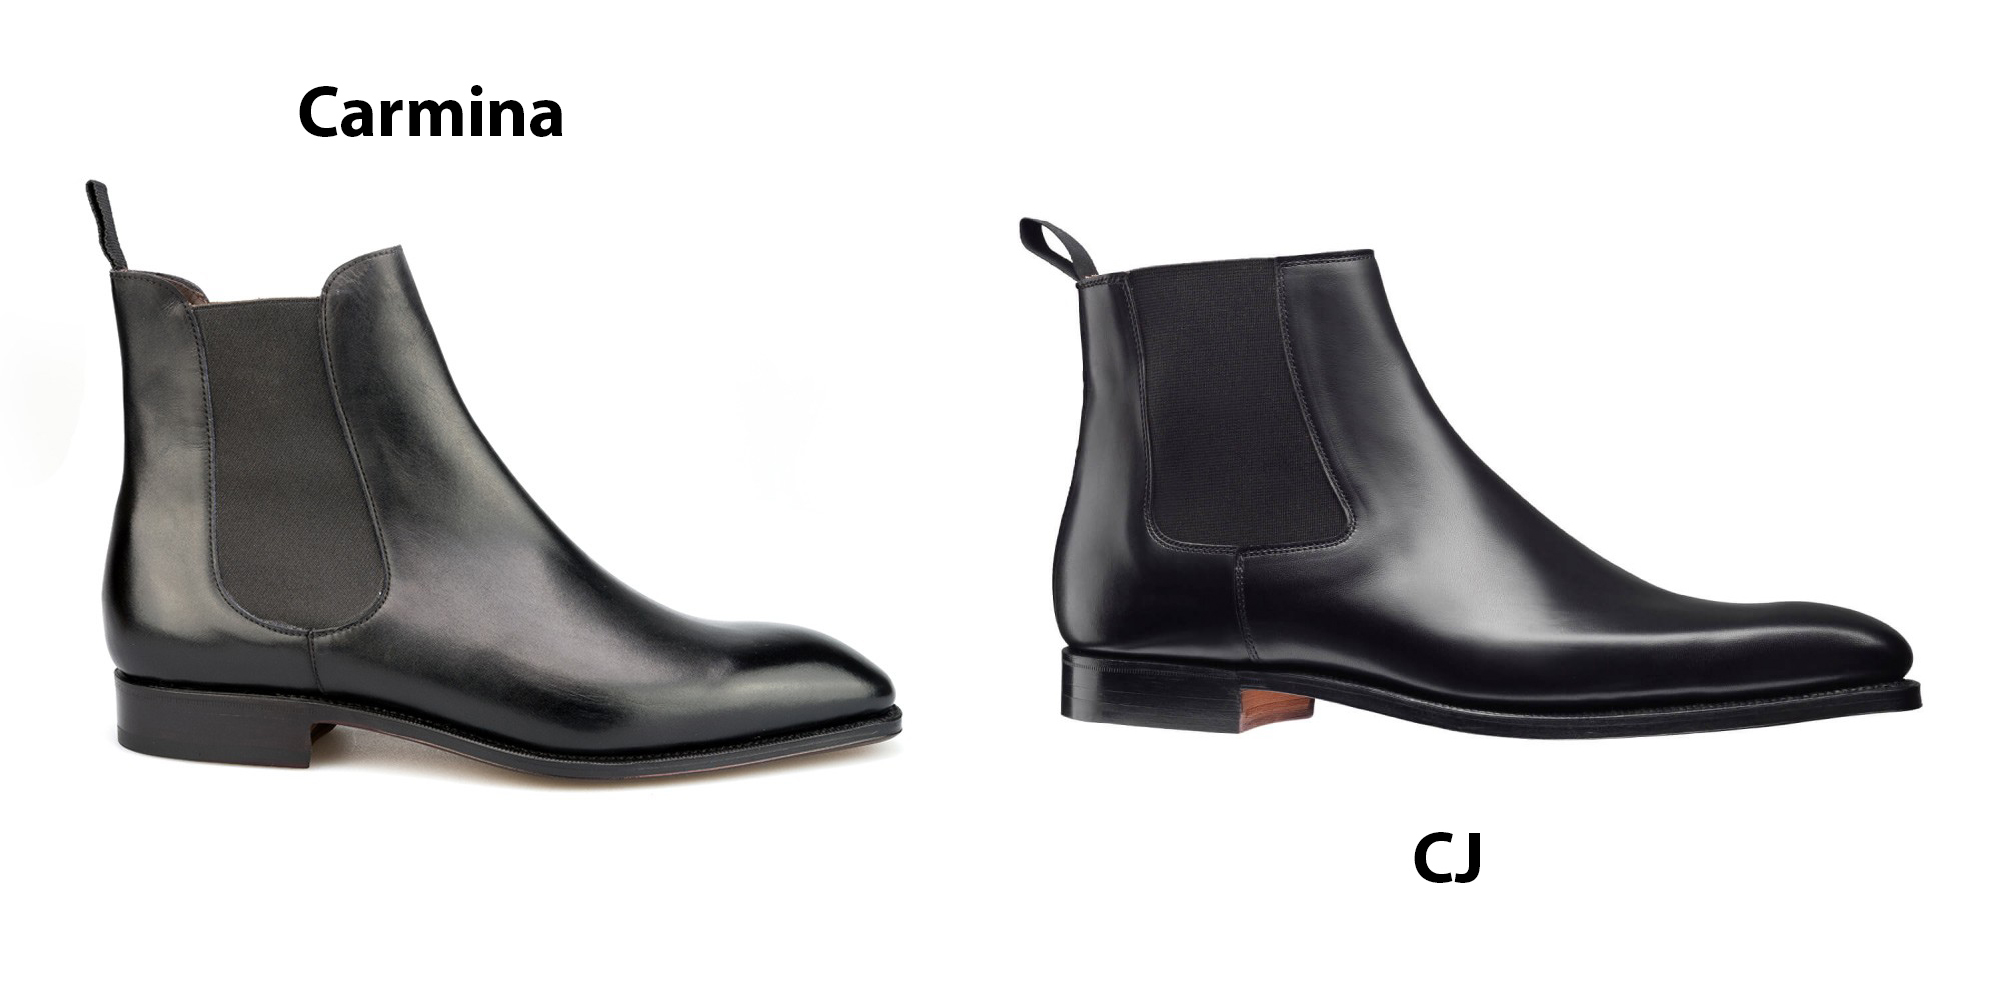 chelsea_boots_carmina_80216_ladl.jpg